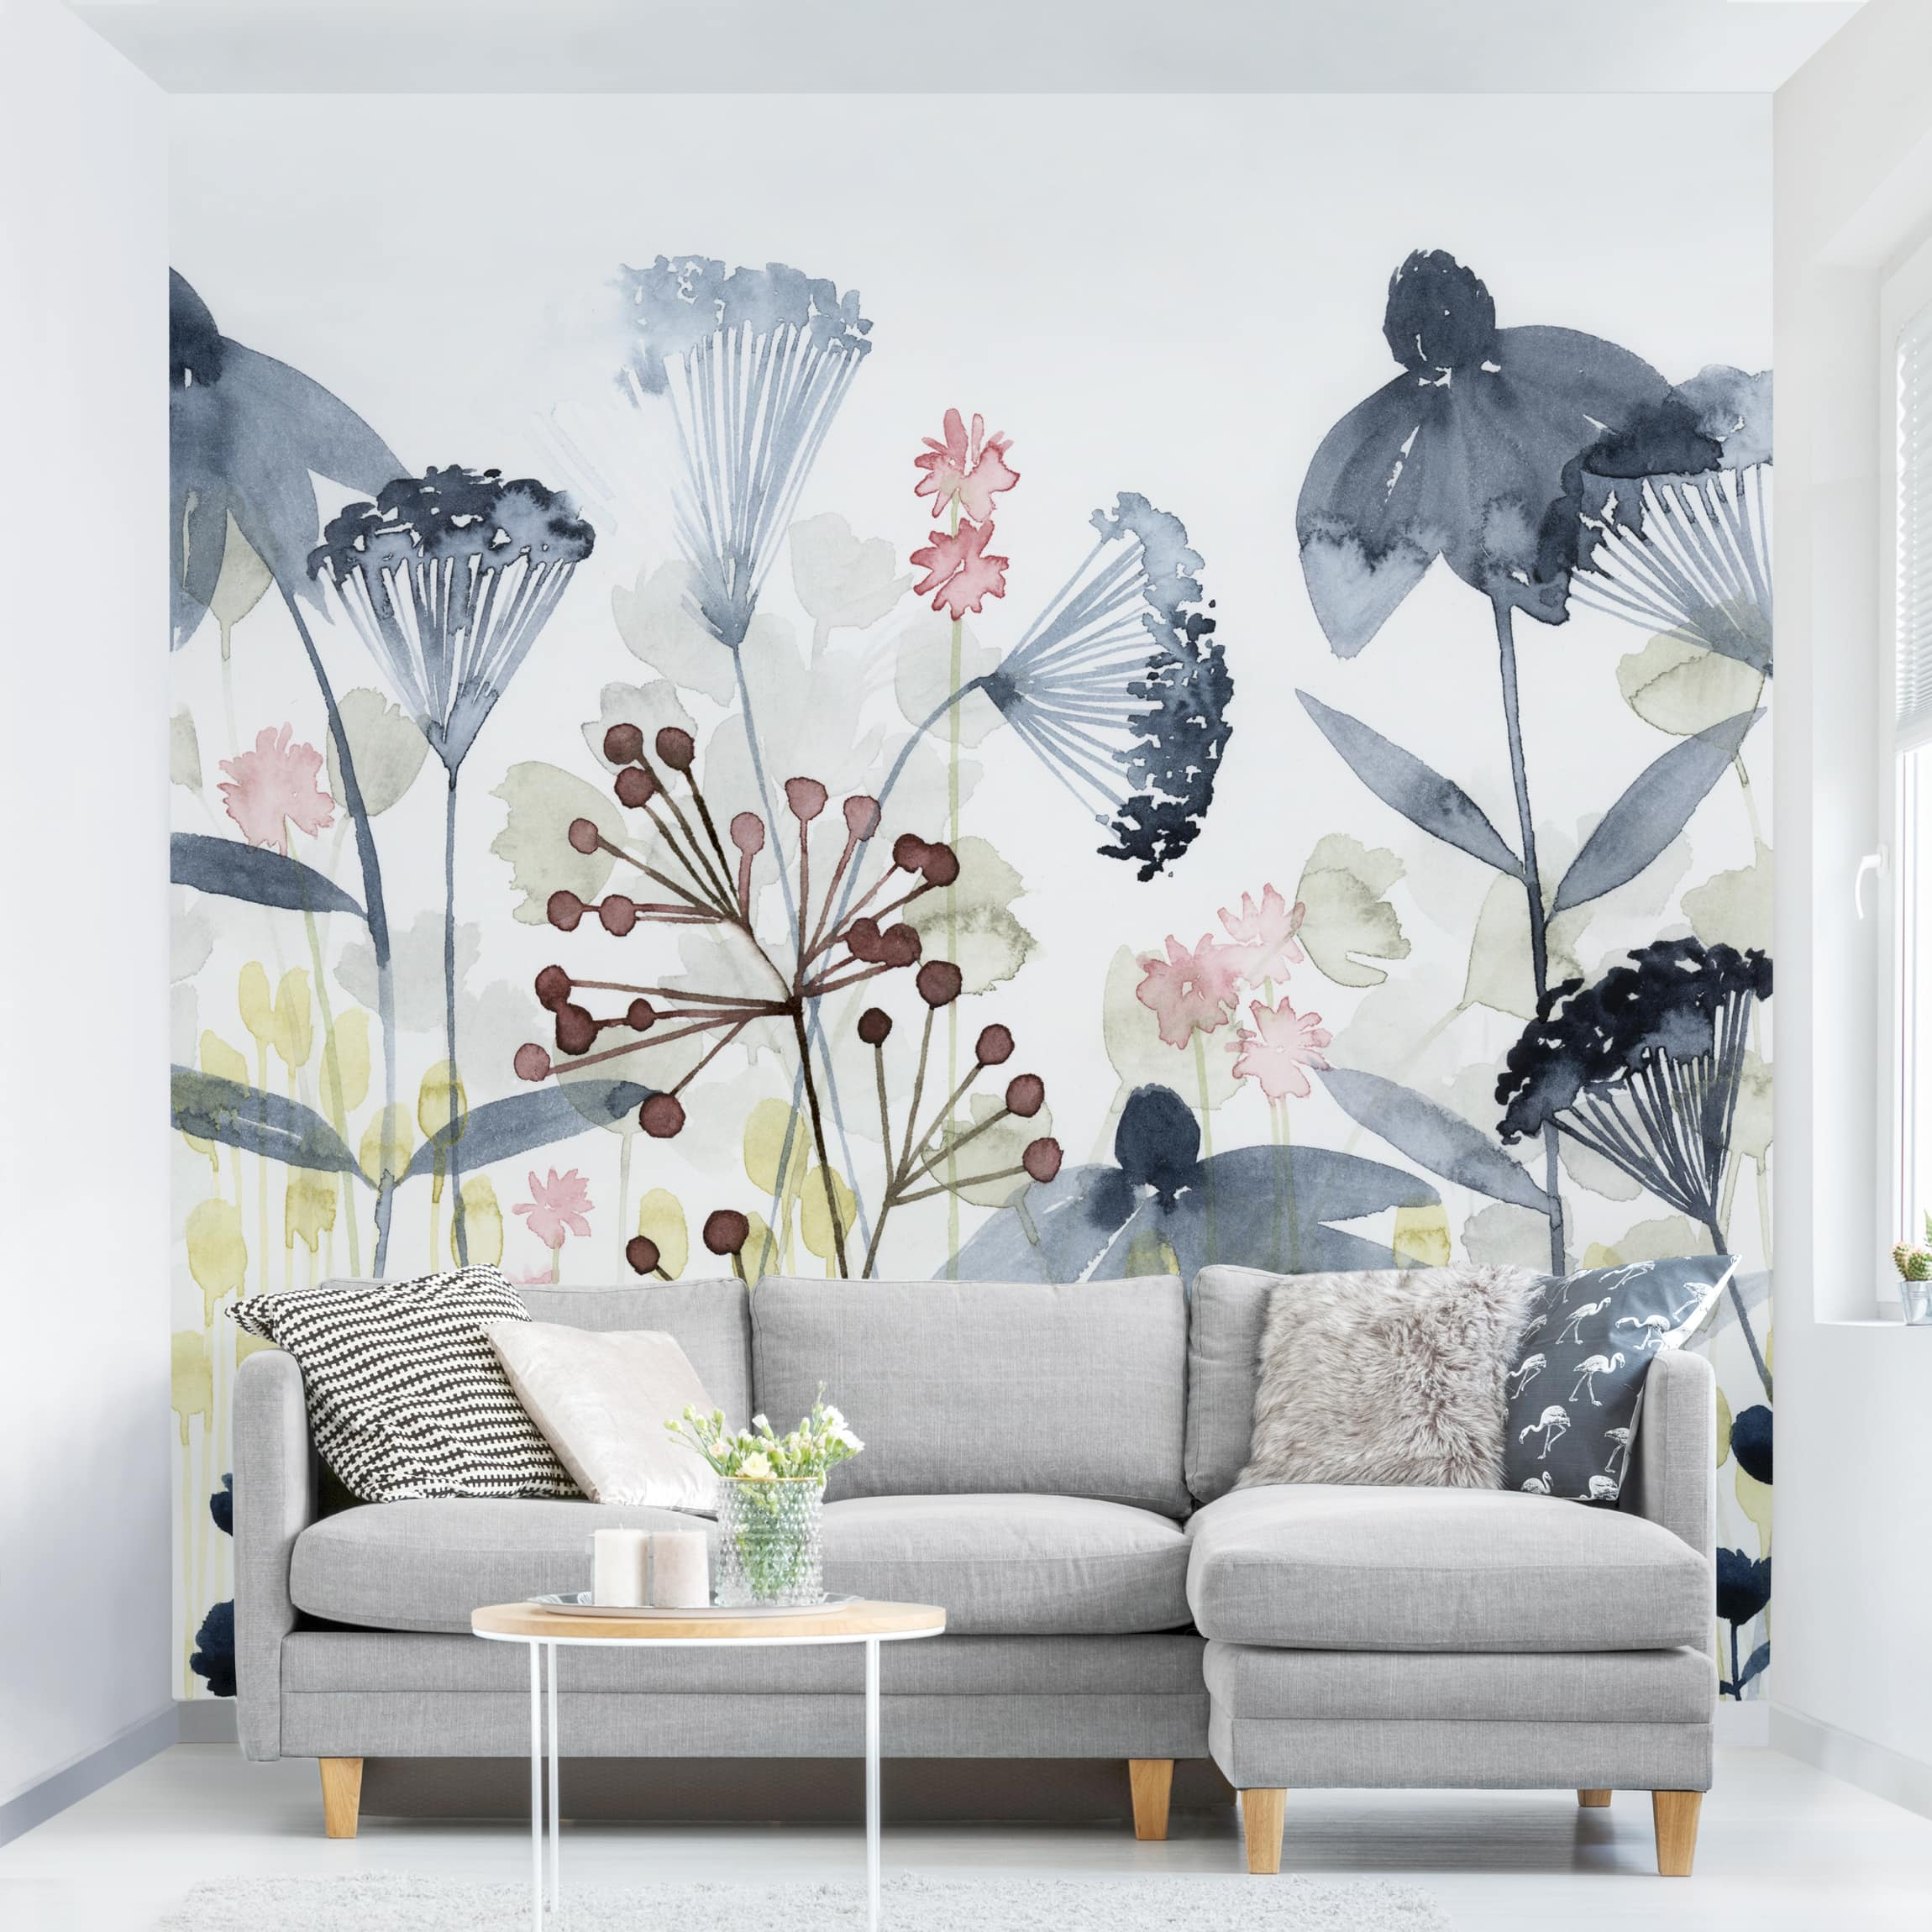 Relativ Tapete selbstklebend - Wildblumen Aquarell I - Fototapete Quadrat CX35